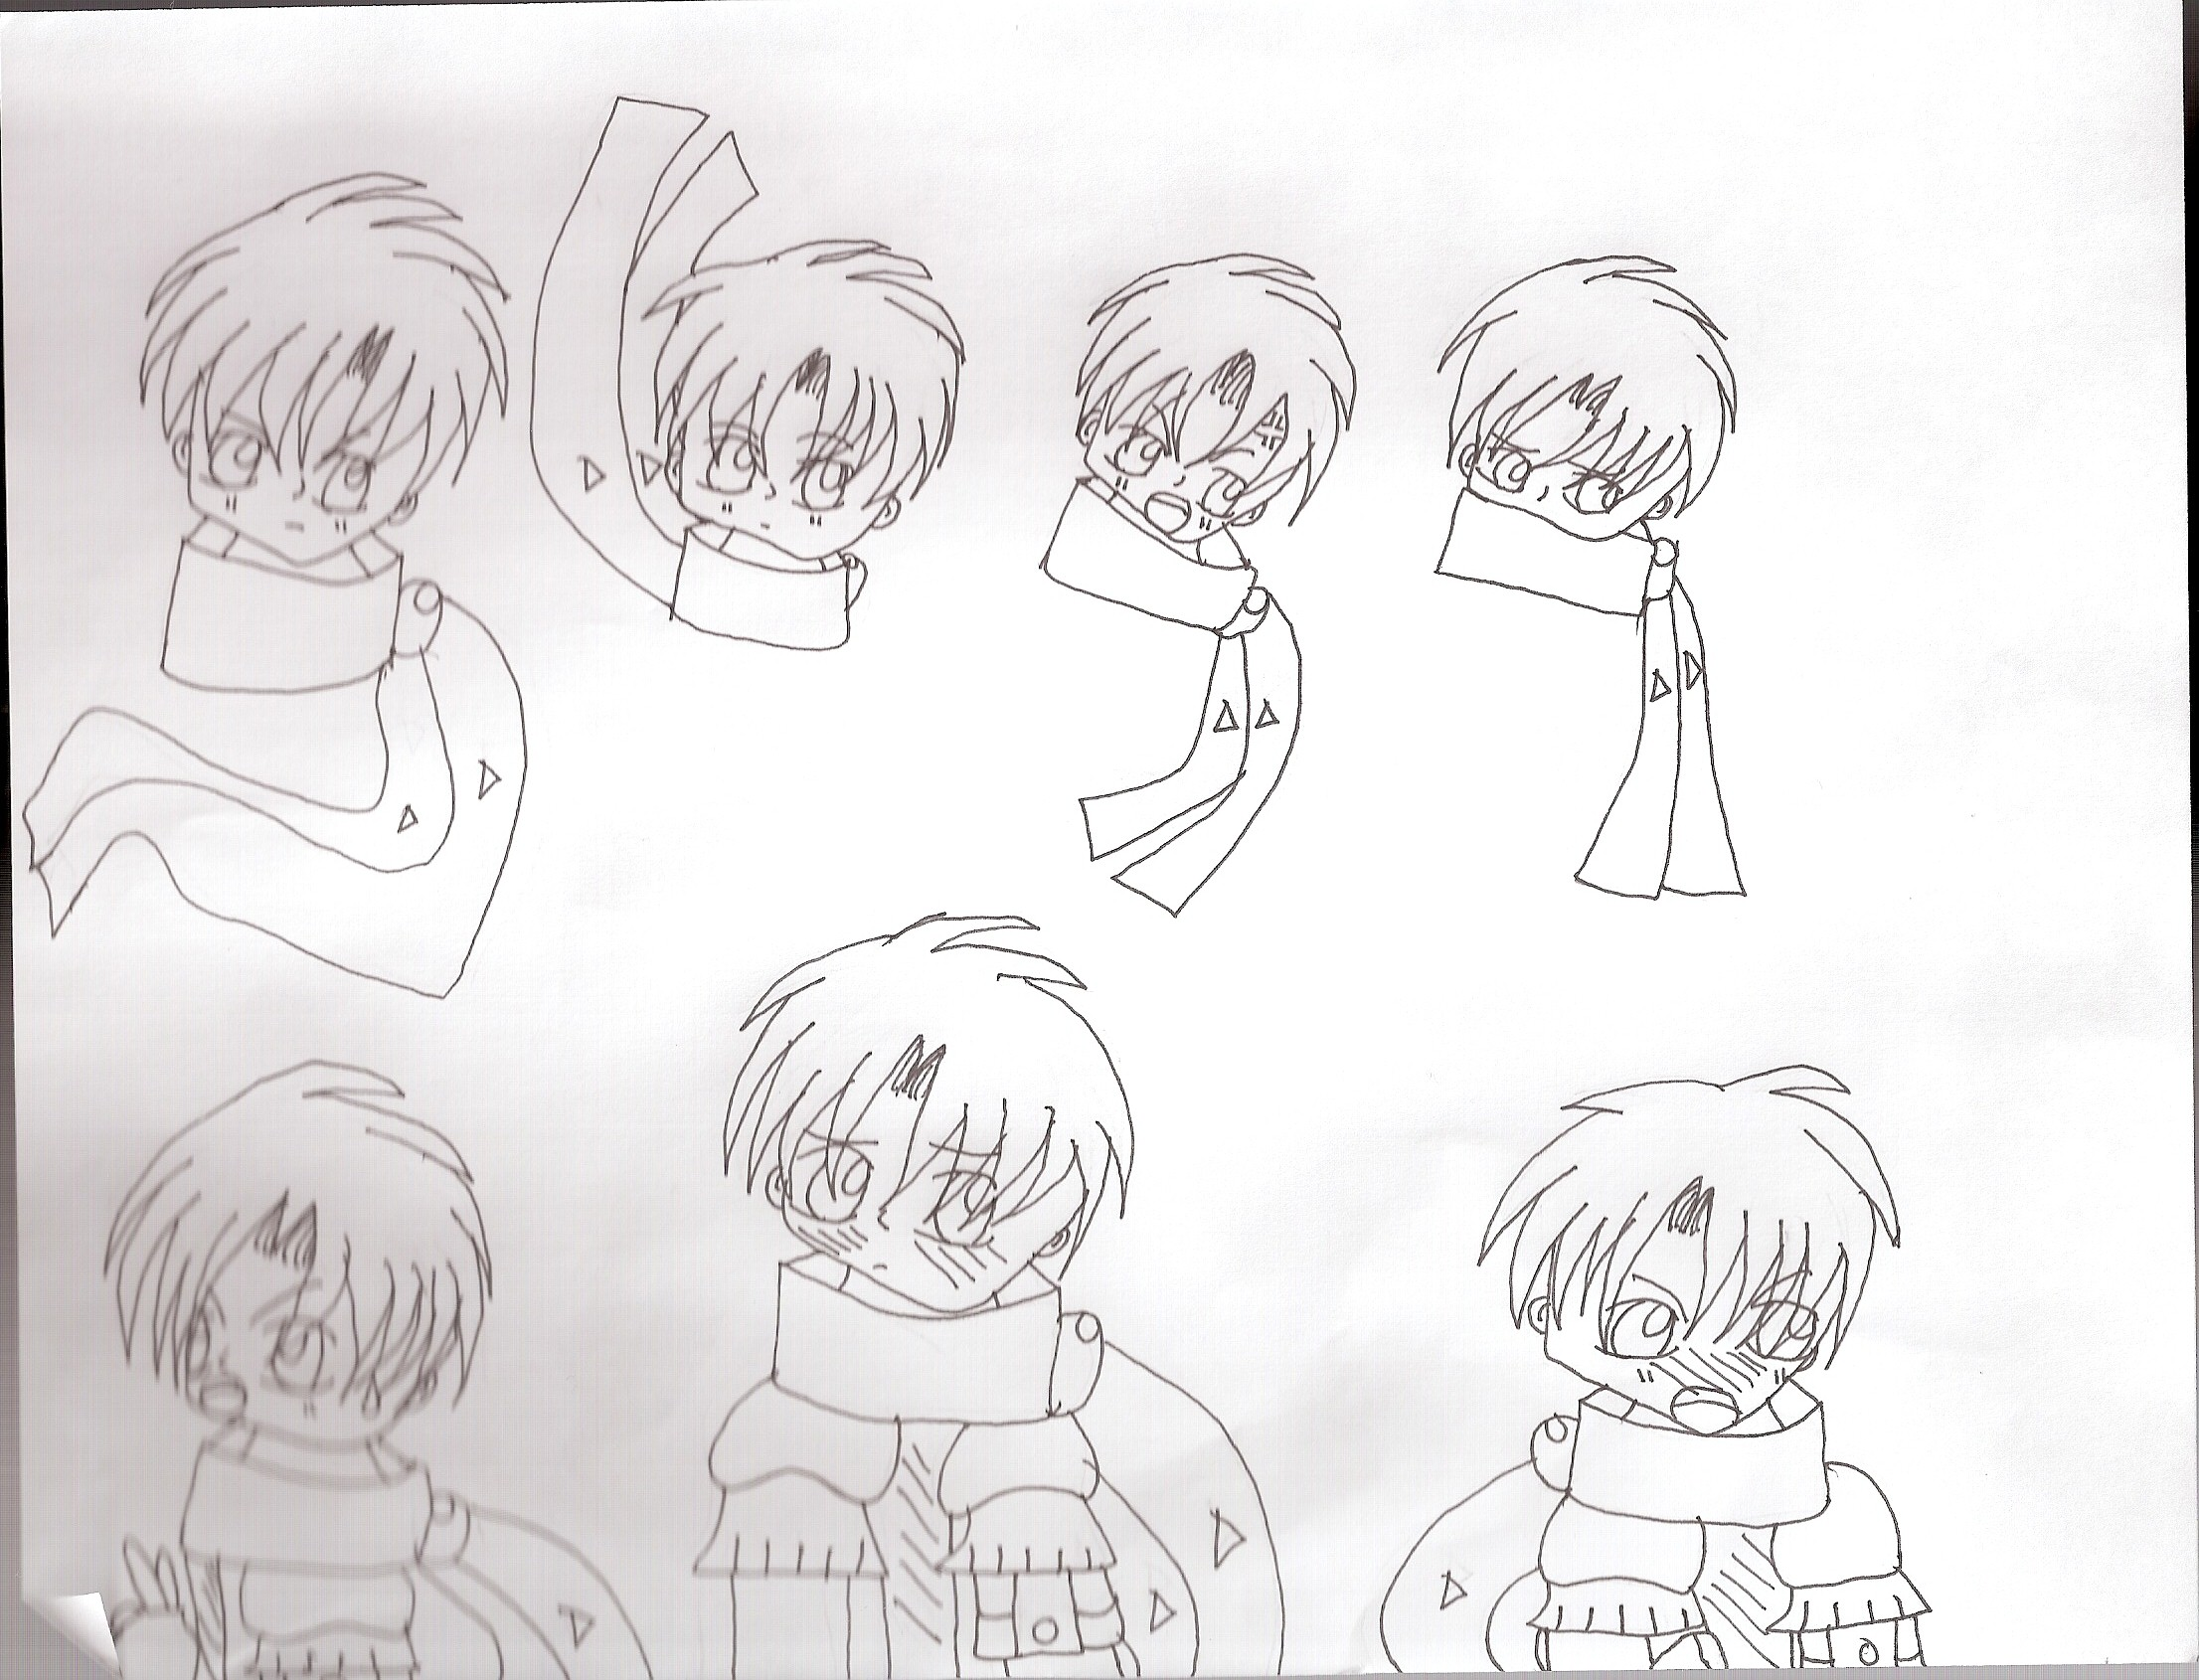 Many faces of Jet enduro by Narukaze